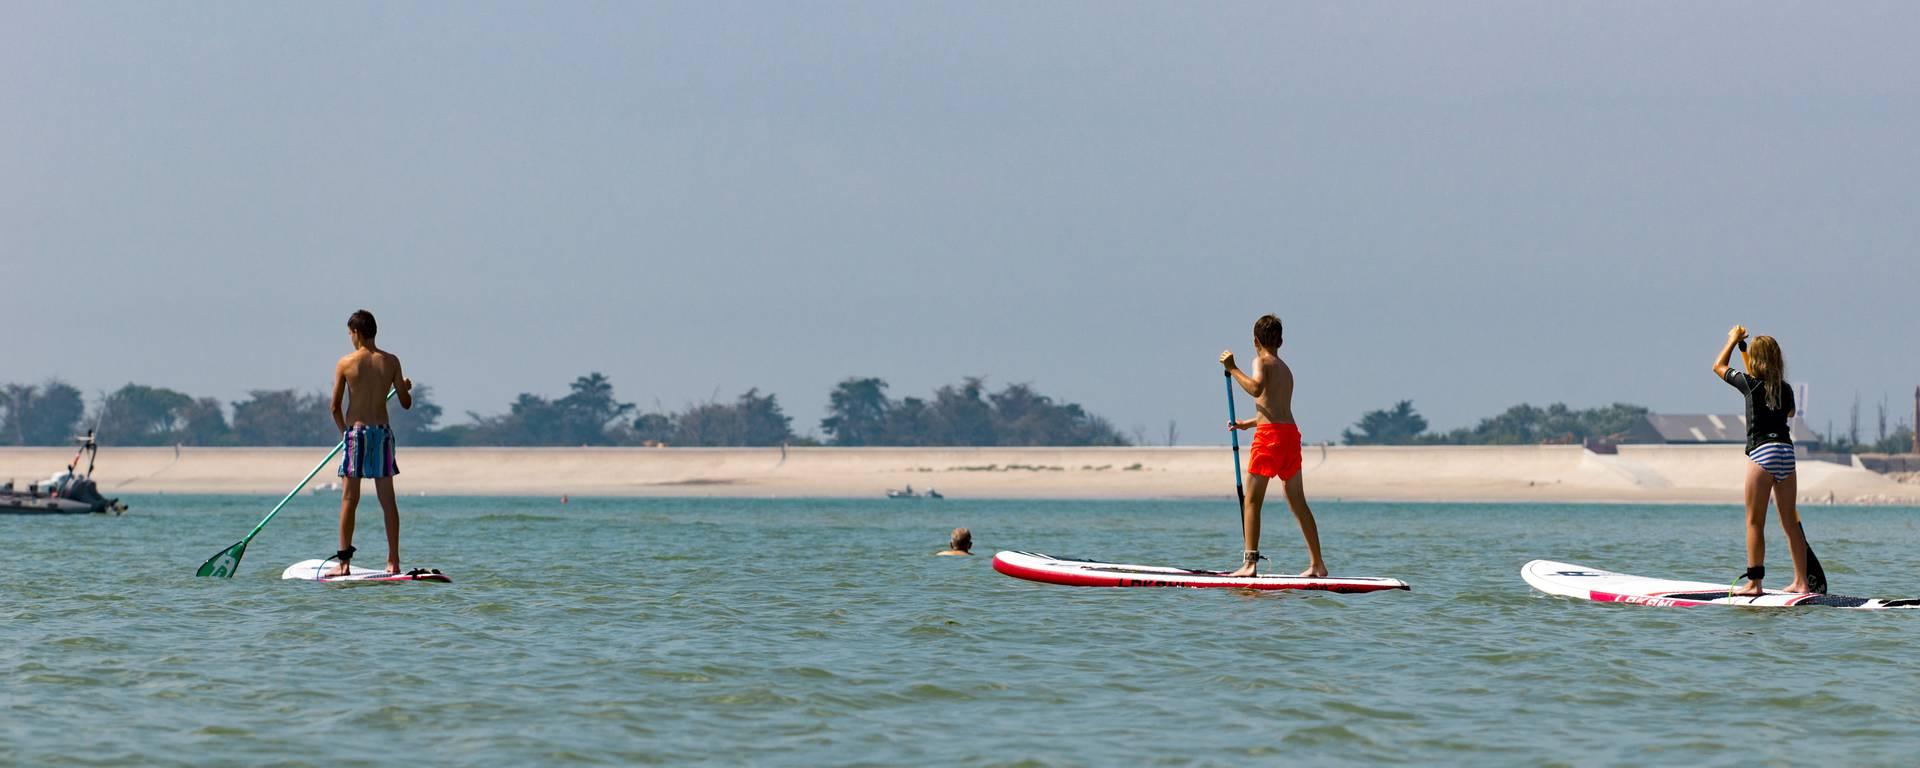 Le paddle en mer par Yann Werdefroy